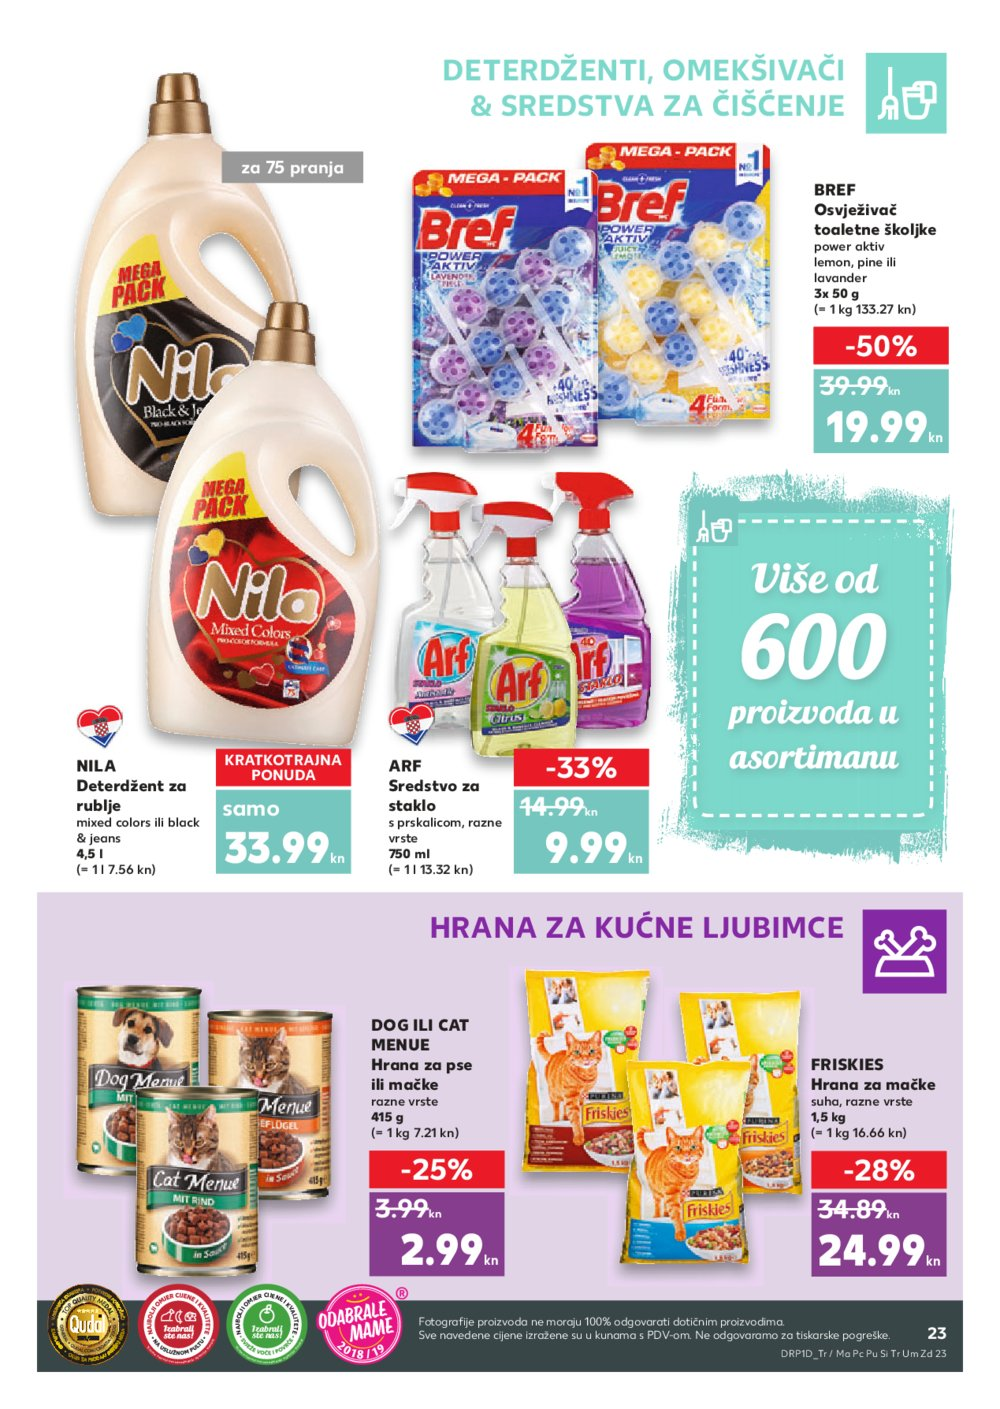 Kaufland katalog Akcija 11.7.-17.7.2019. Pu, Si, Tr, Zd, Umag